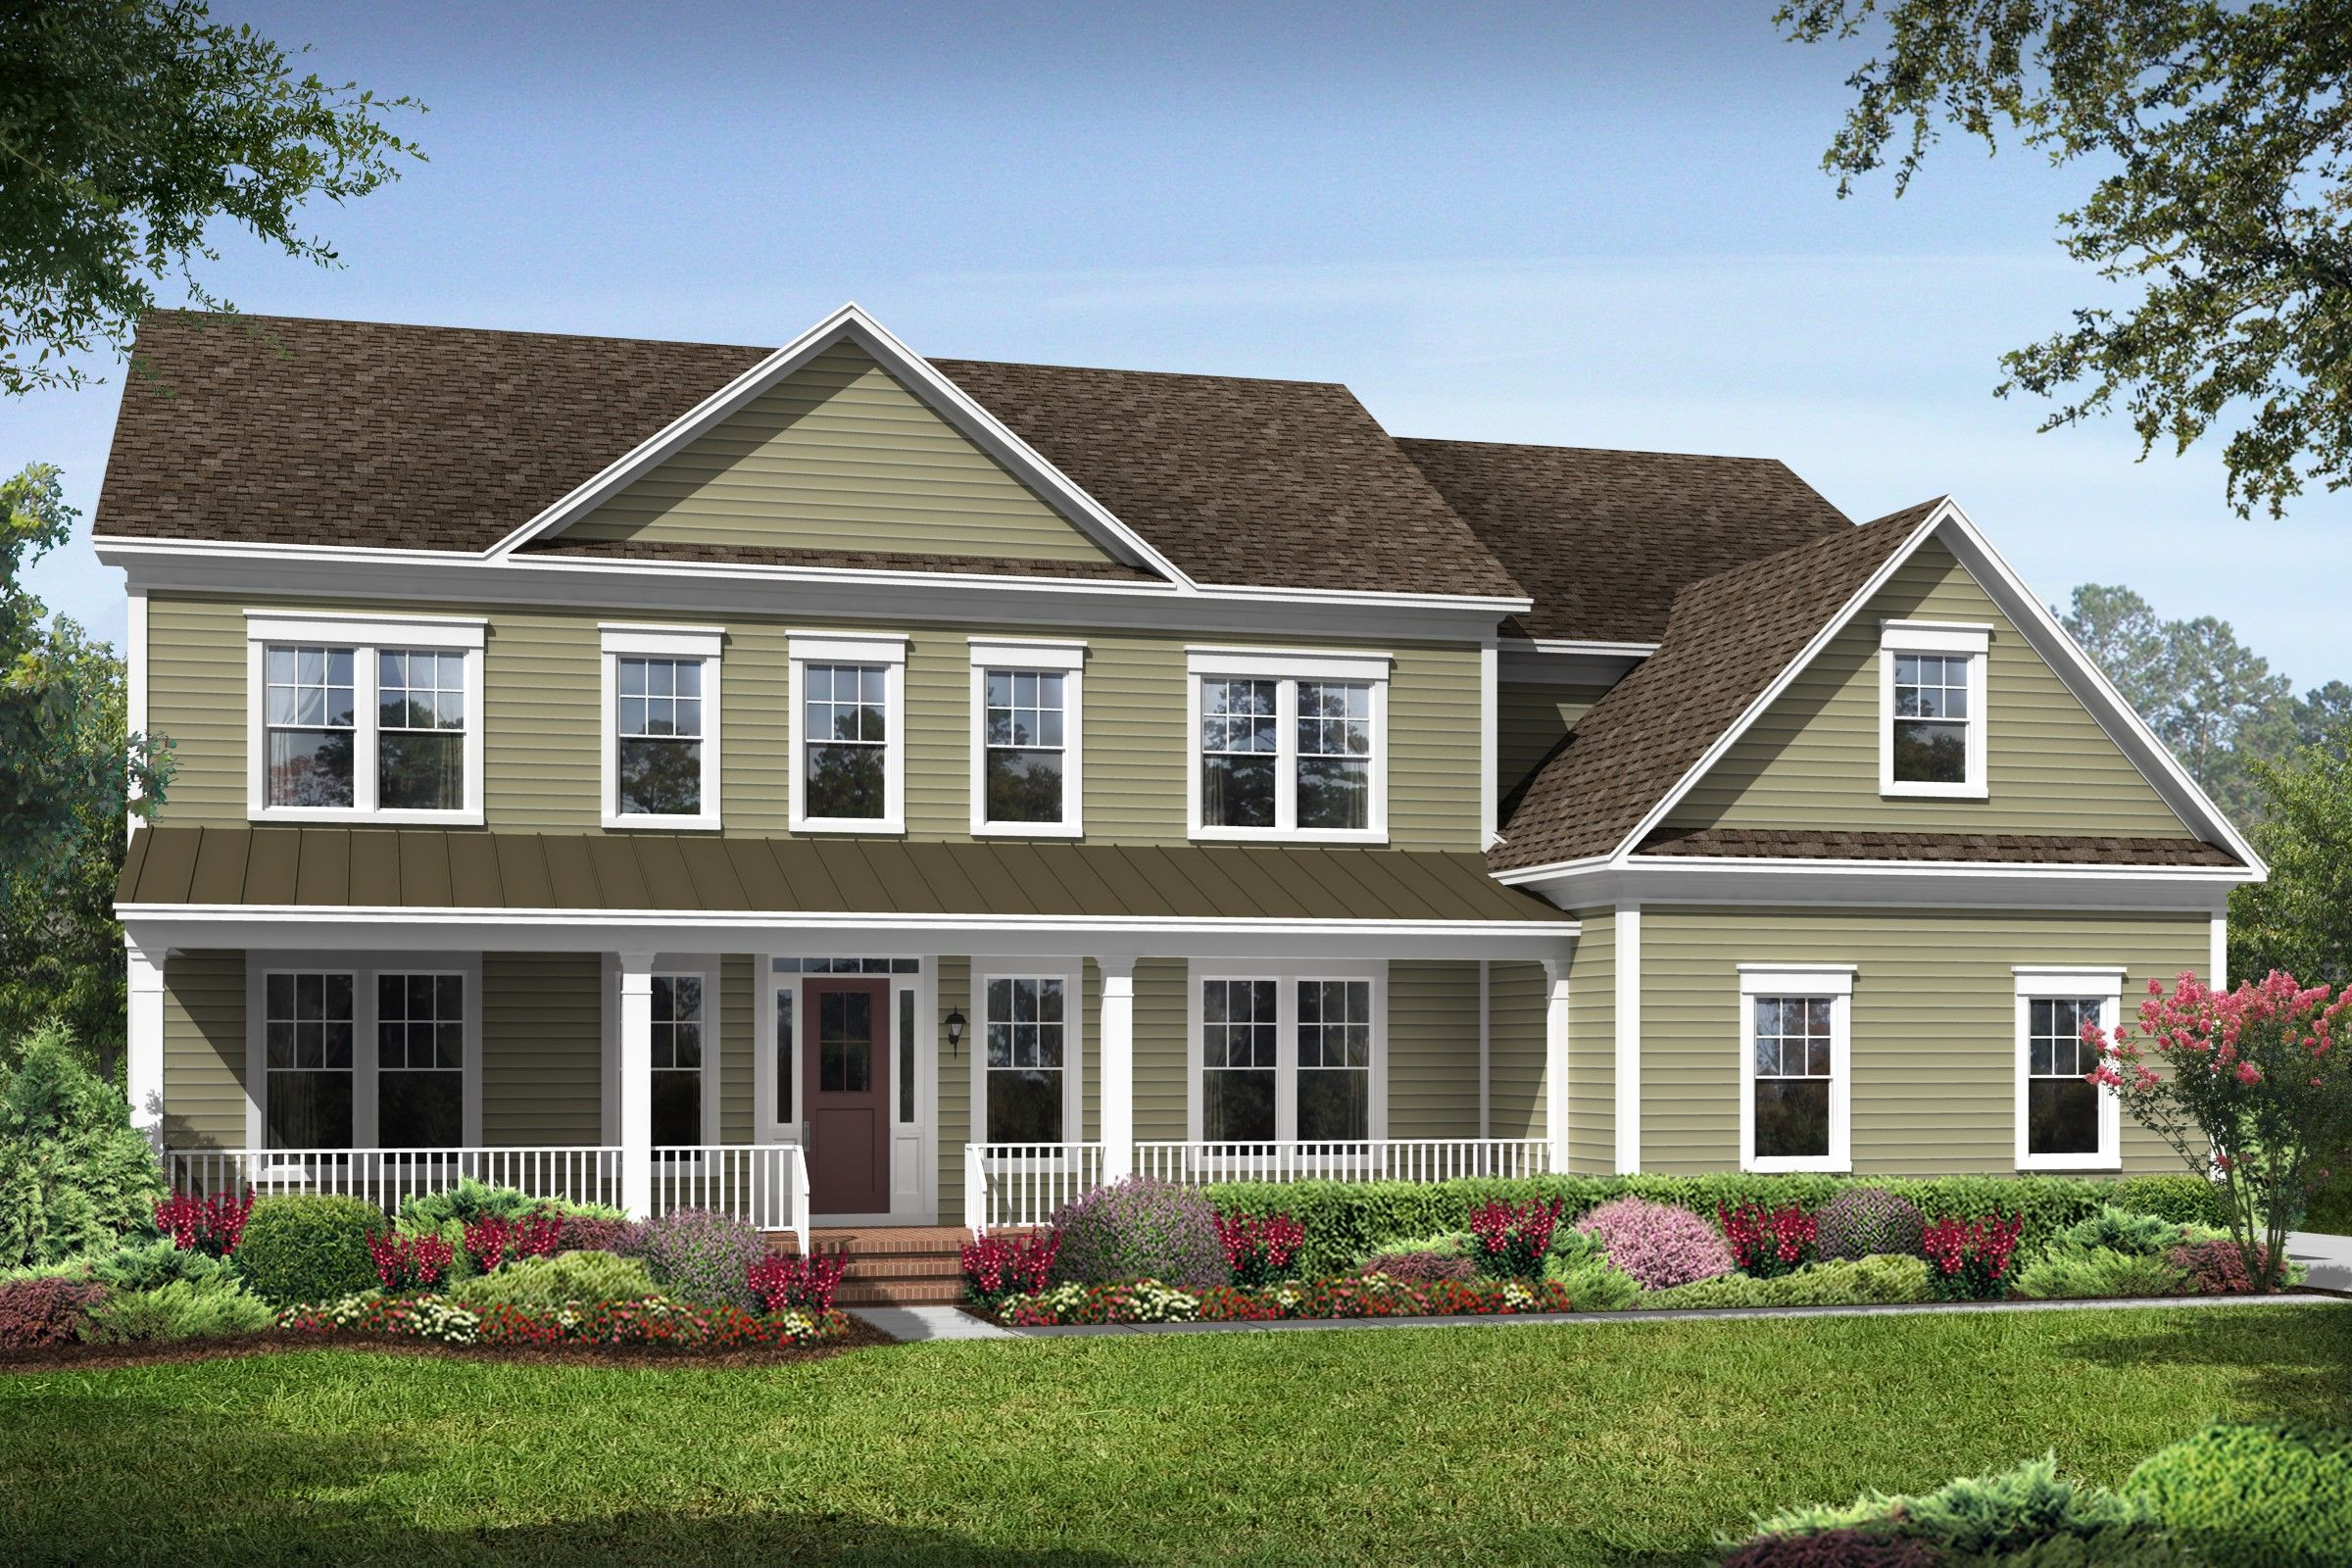 Real Estate at 23805 Weathervane Place, Ashburn in Loudoun County, VA 20148